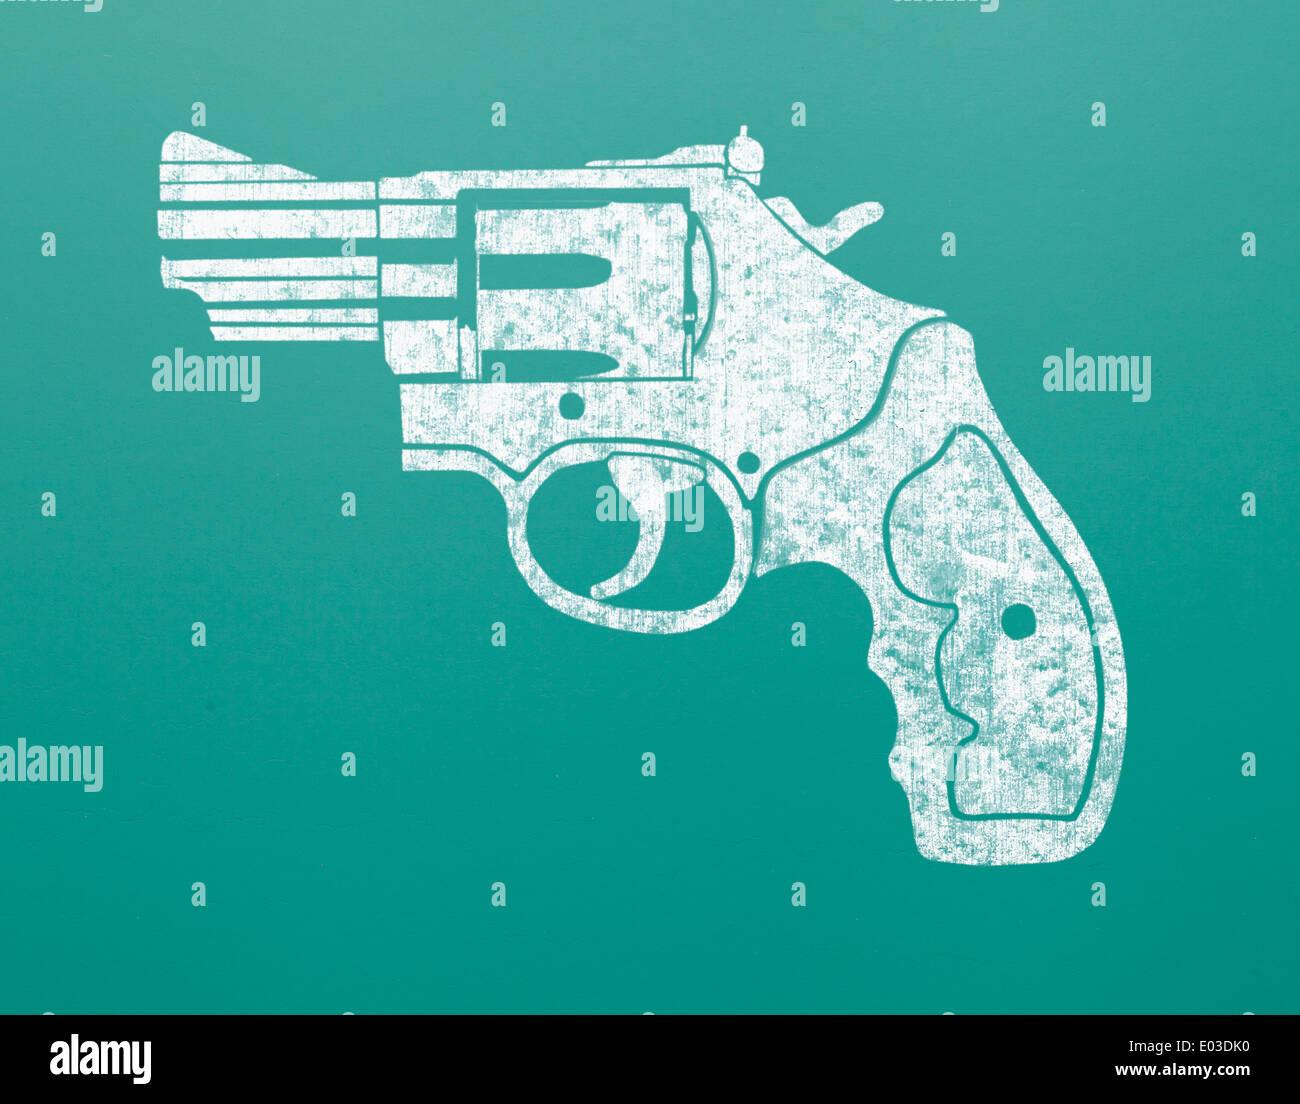 Drawing of Hand Gun on Green Chalk Board. - Stock Image